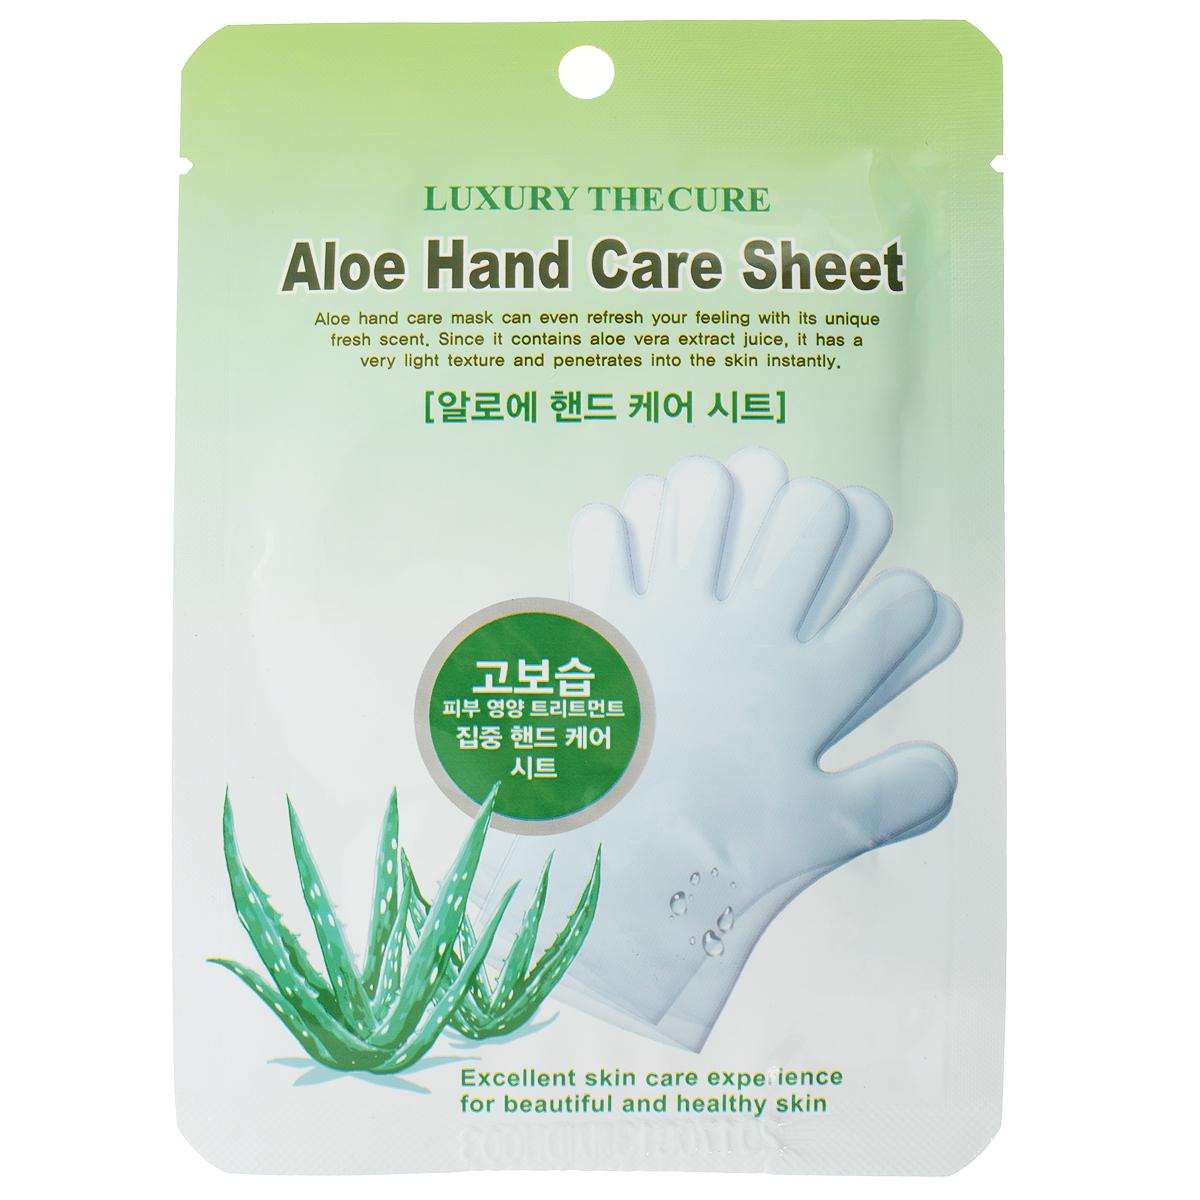 LS Cosmetic Маска-перчатки для рук с Алоэ, 8г х 2 шт 1494